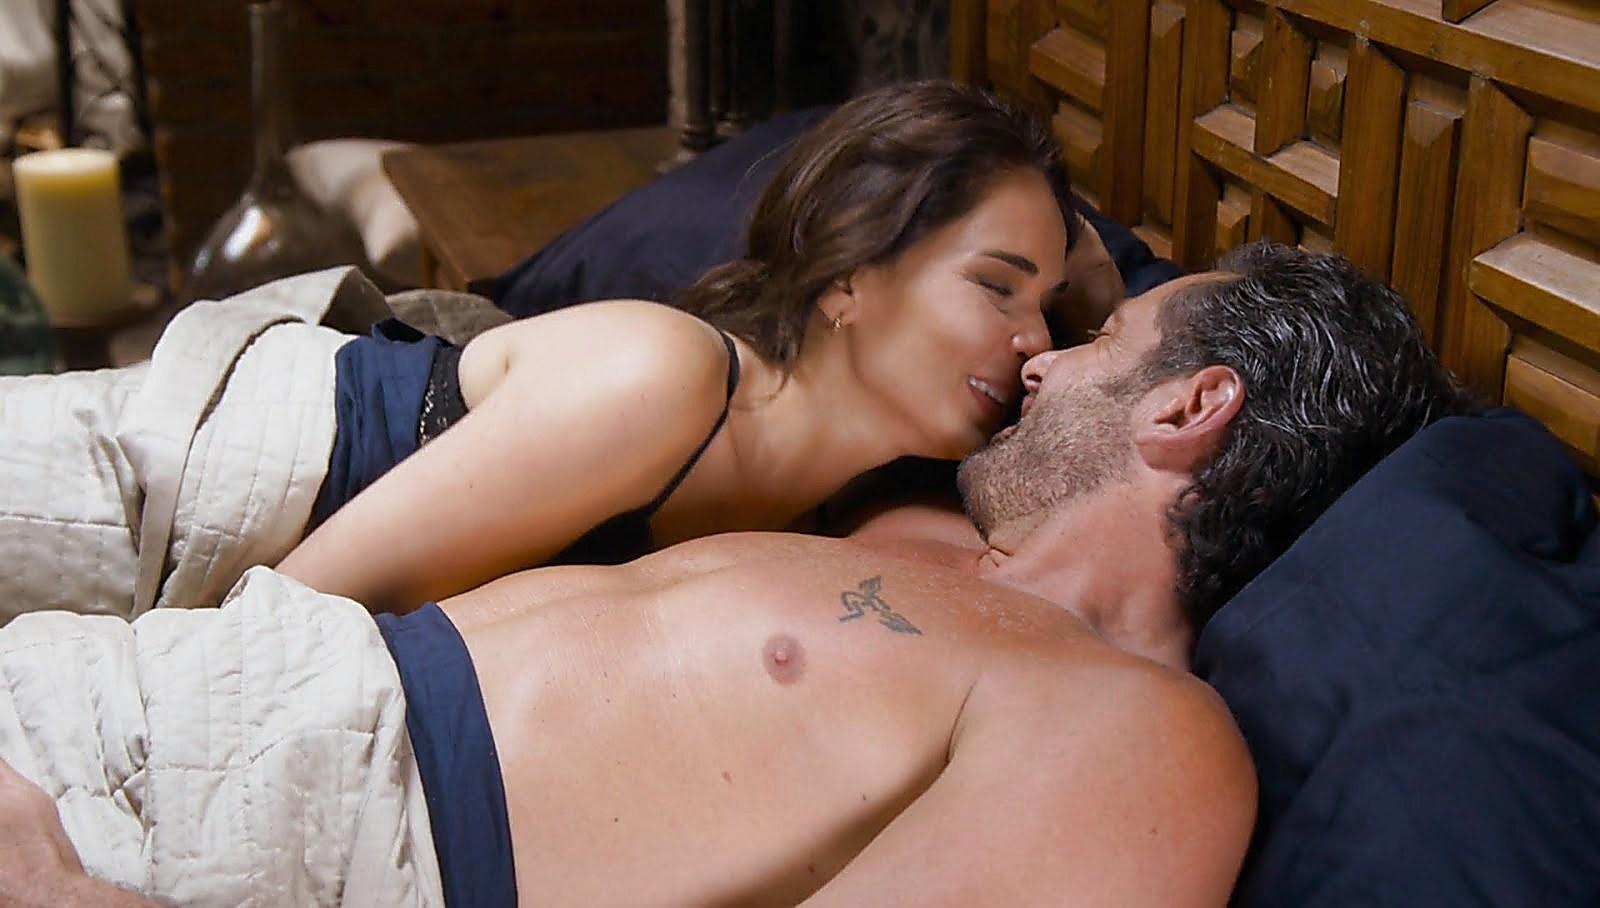 Carlos Ferro sexy shirtless scene November 3, 2017, 3pm